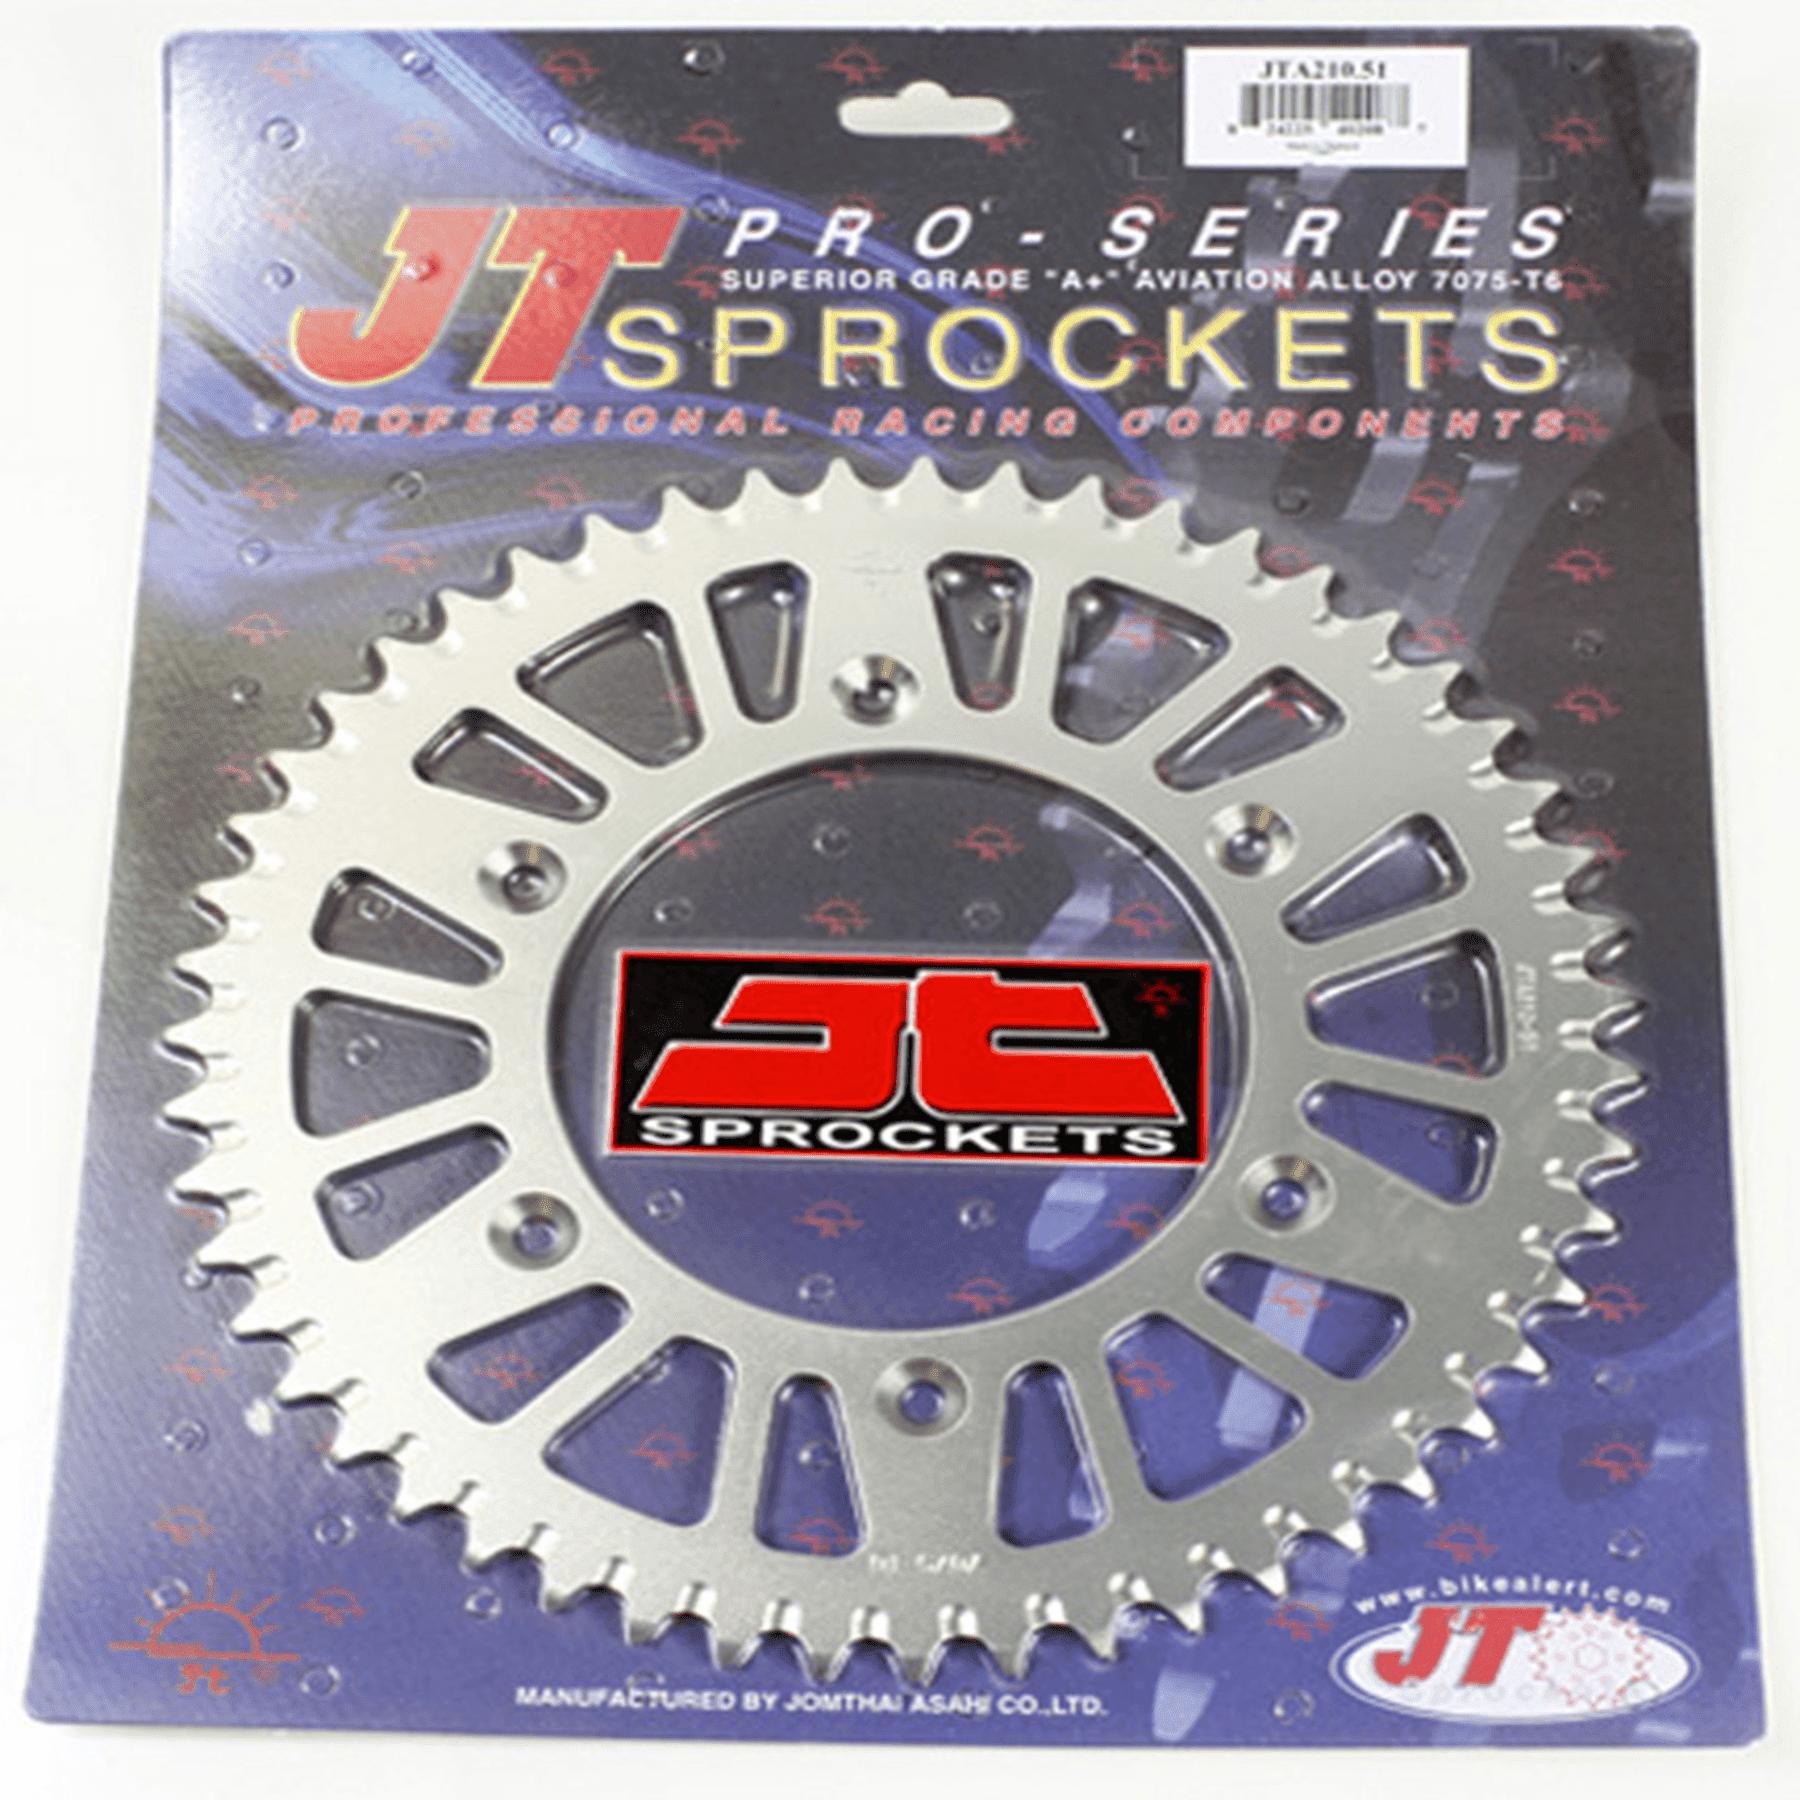 JT REAR ALLOY SPROCKET (JTA210), 51 TOOTH